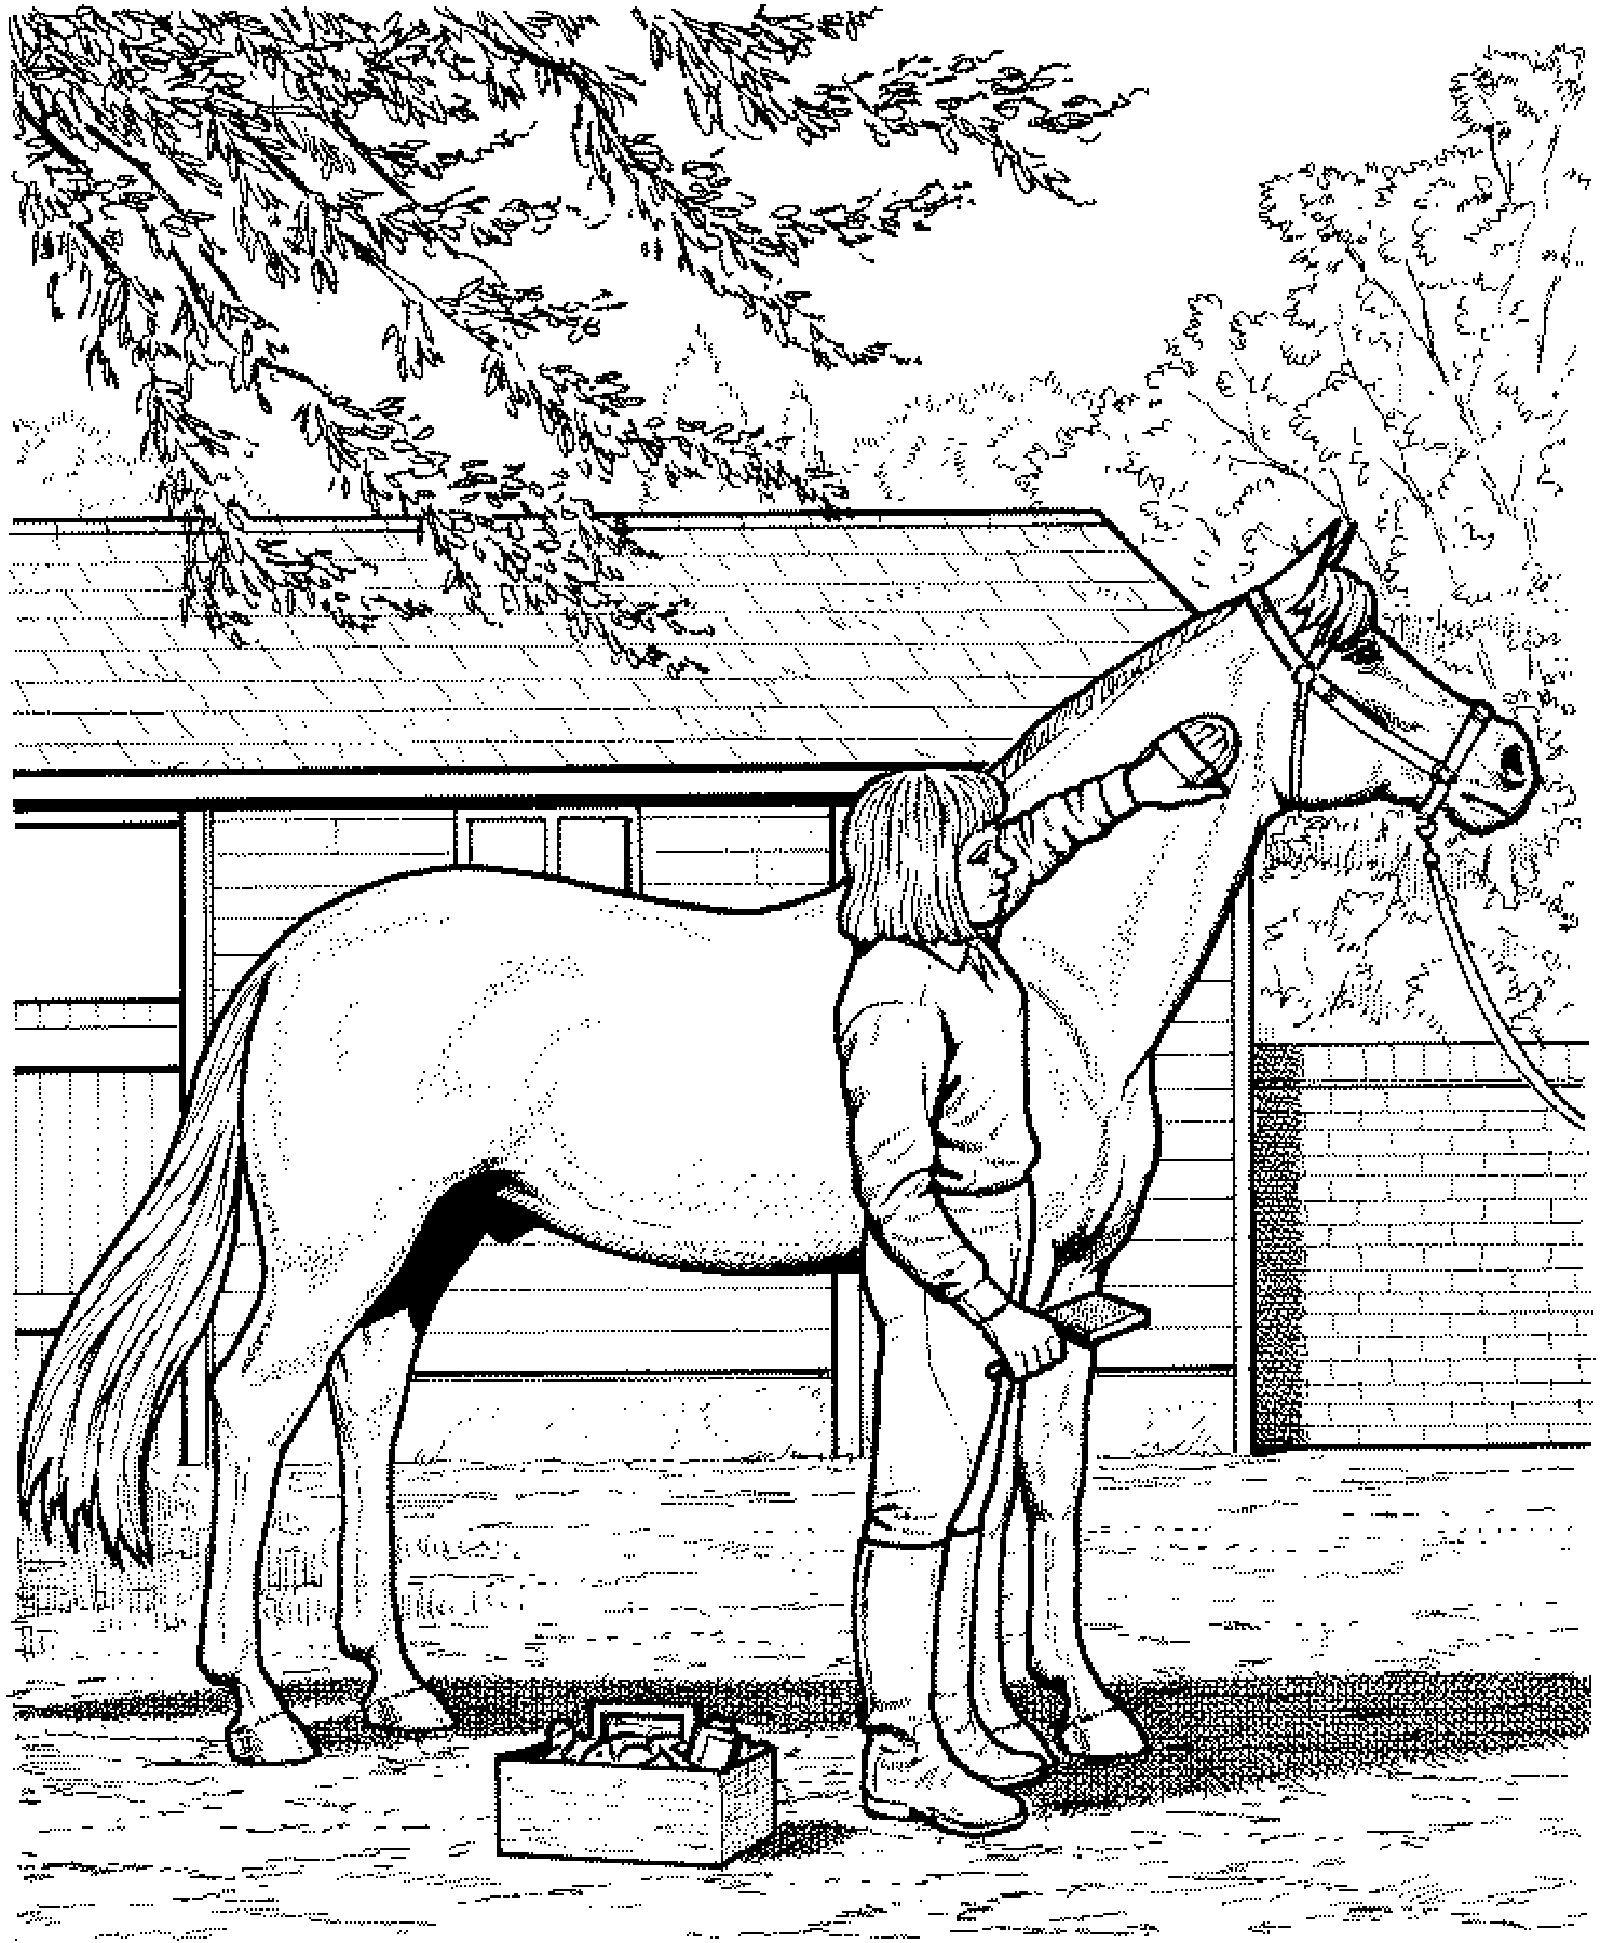 http://www.malvorlagen.net/ausmalbilder/pferde/b%C3 ...